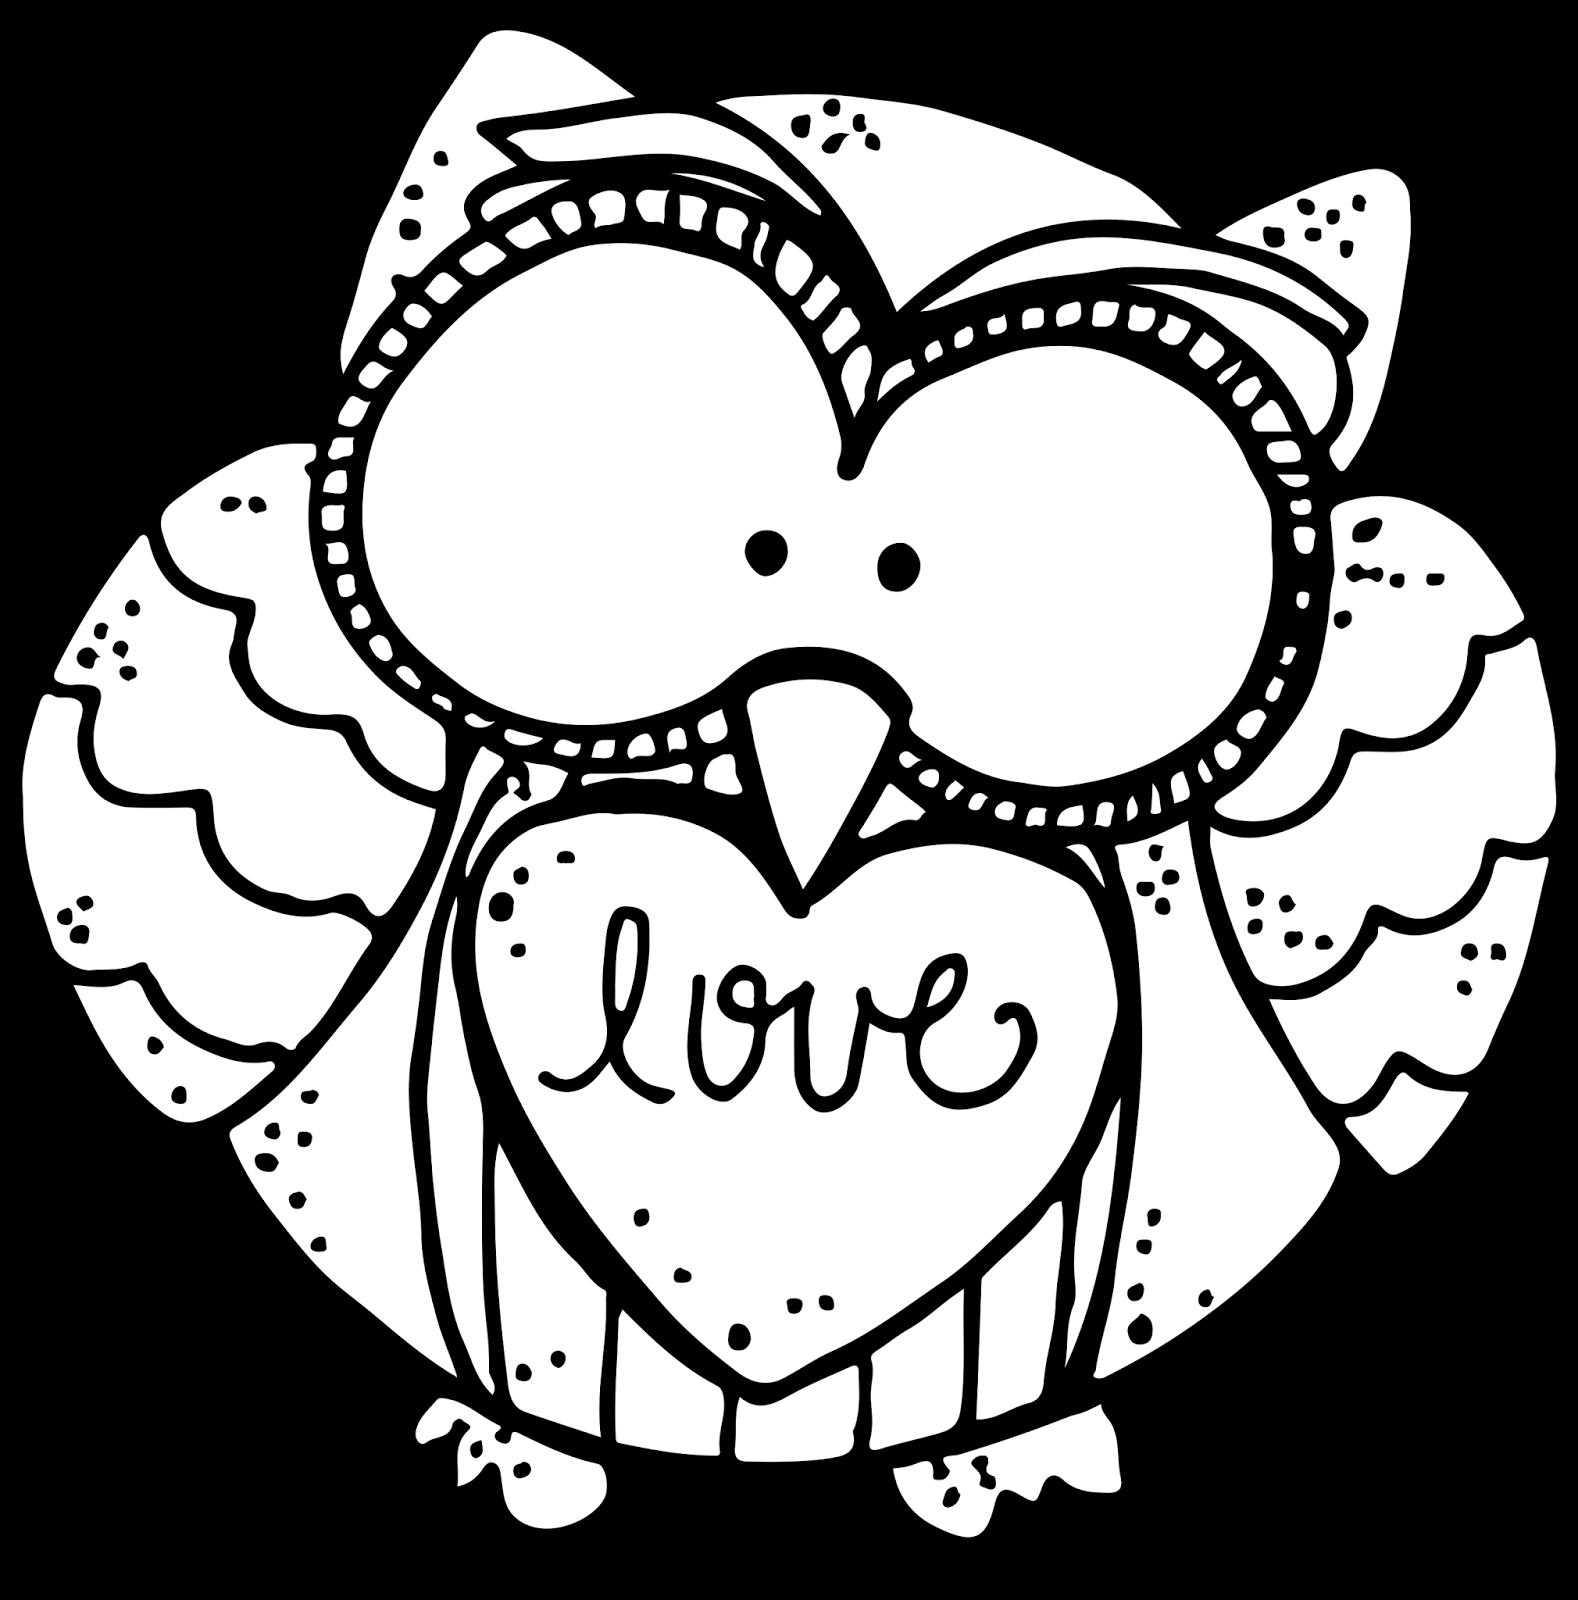 Clipart owl black and white. Melonheadz meet my friend